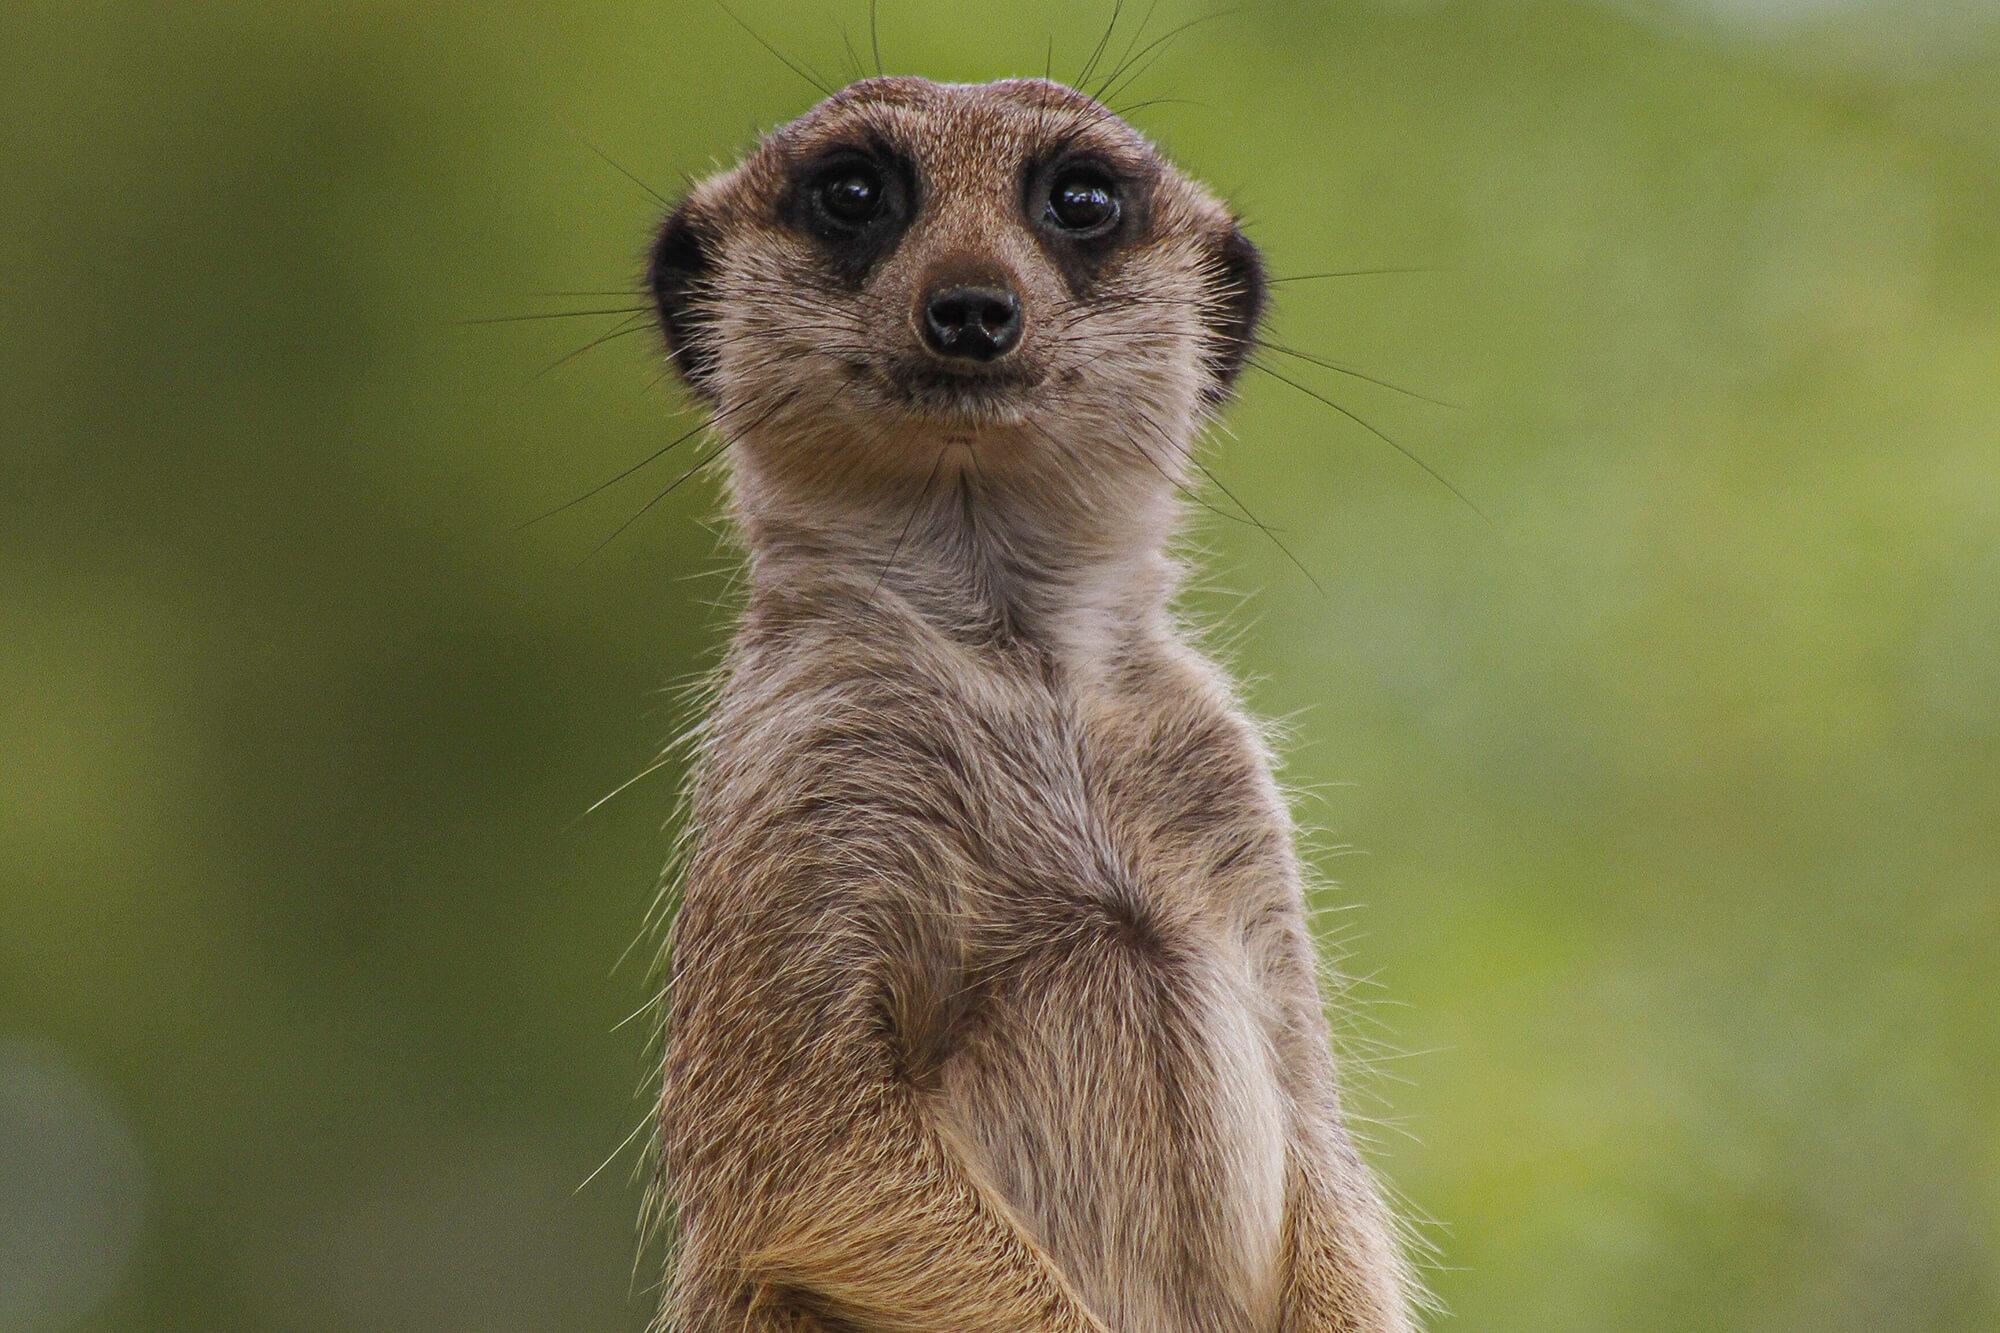 A meerkat stood up looking at the camera